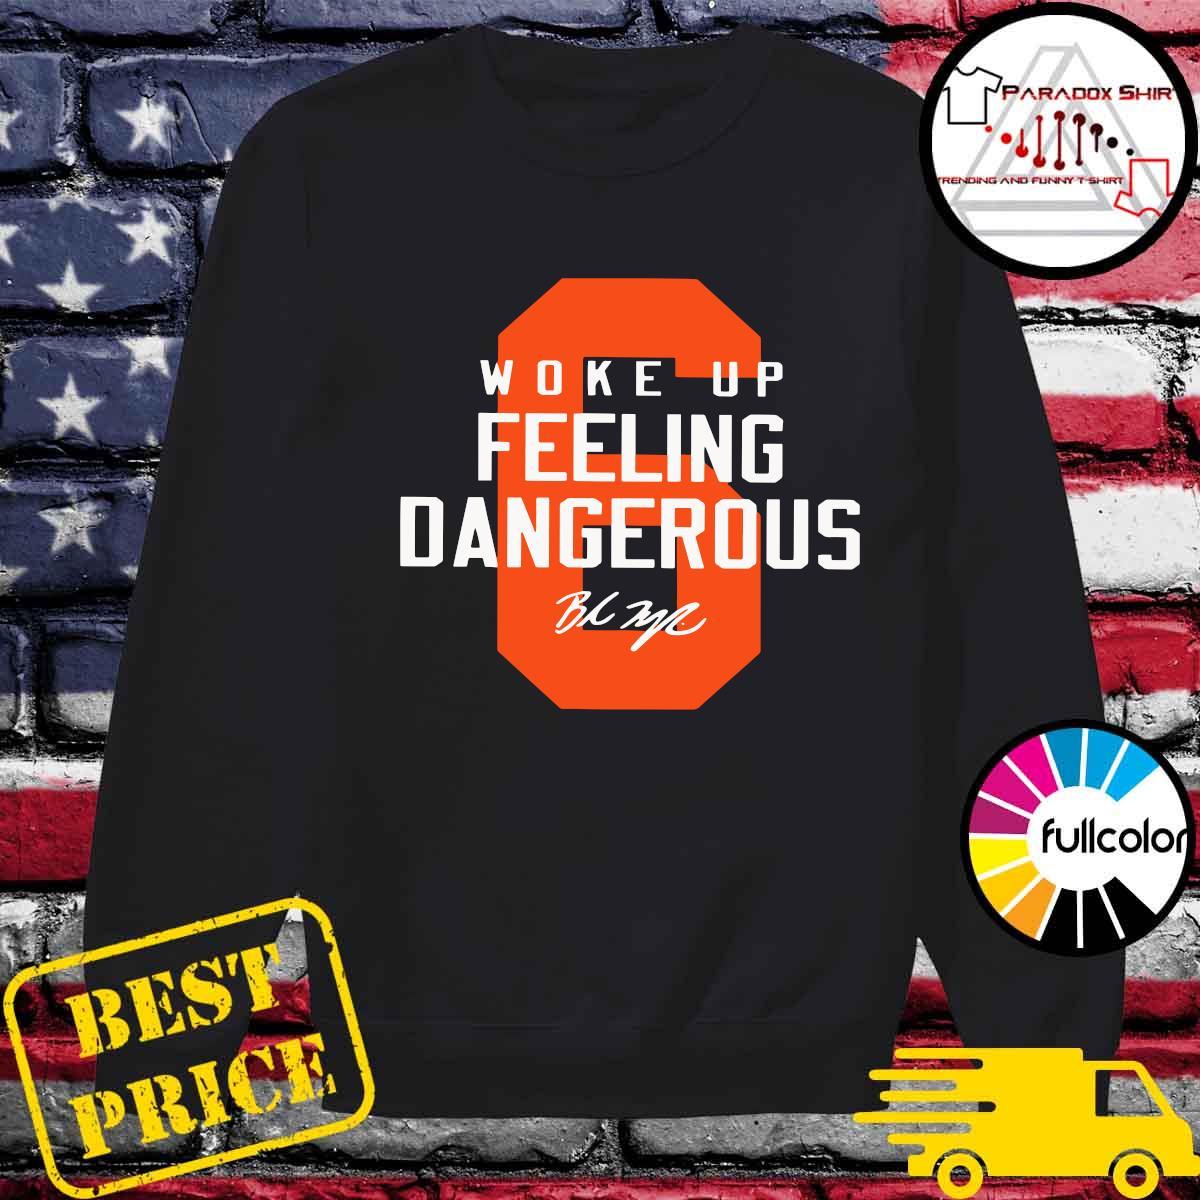 Baker Mayfield 6 Woke Up Feeling Dangerous Signature Shirt Sweater